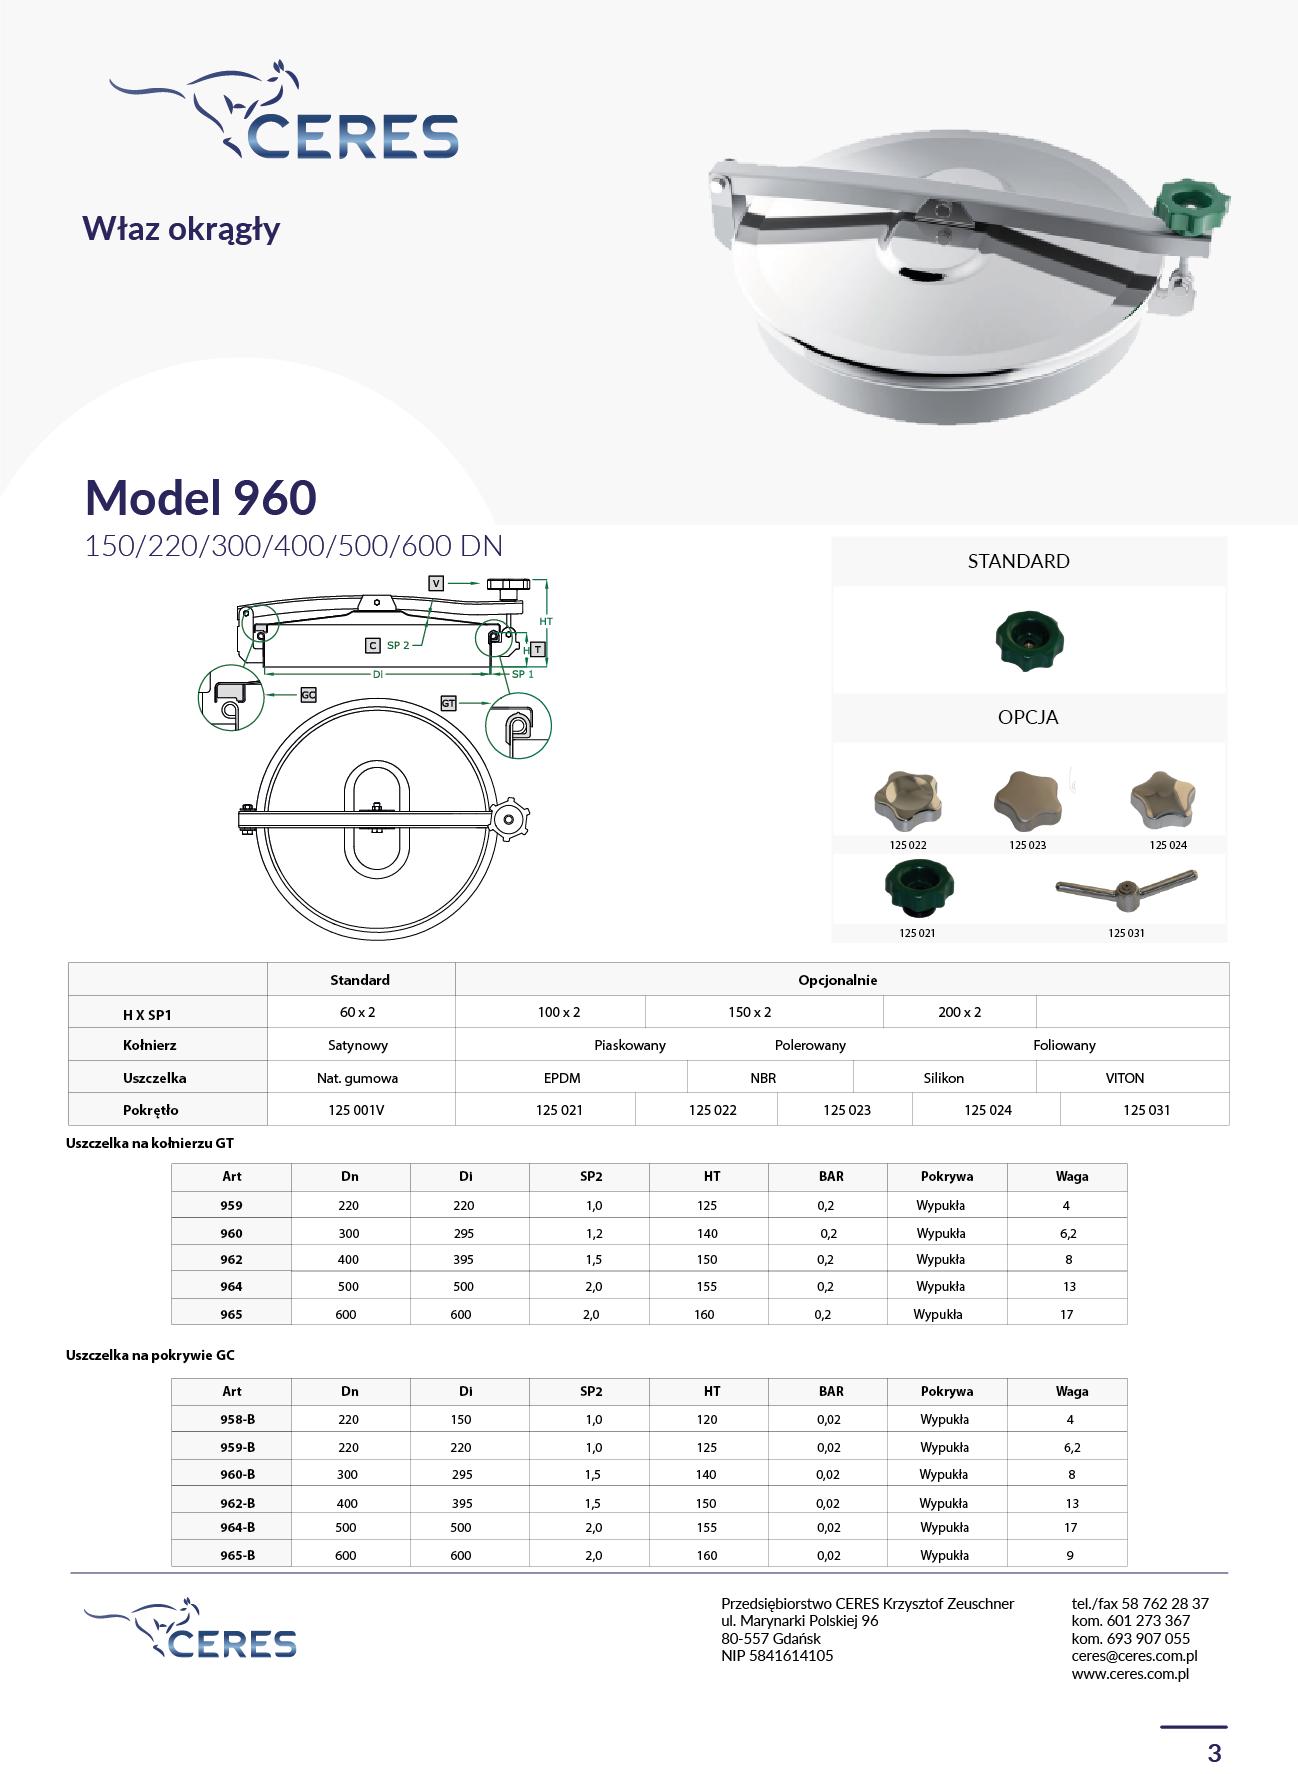 MODEL 960